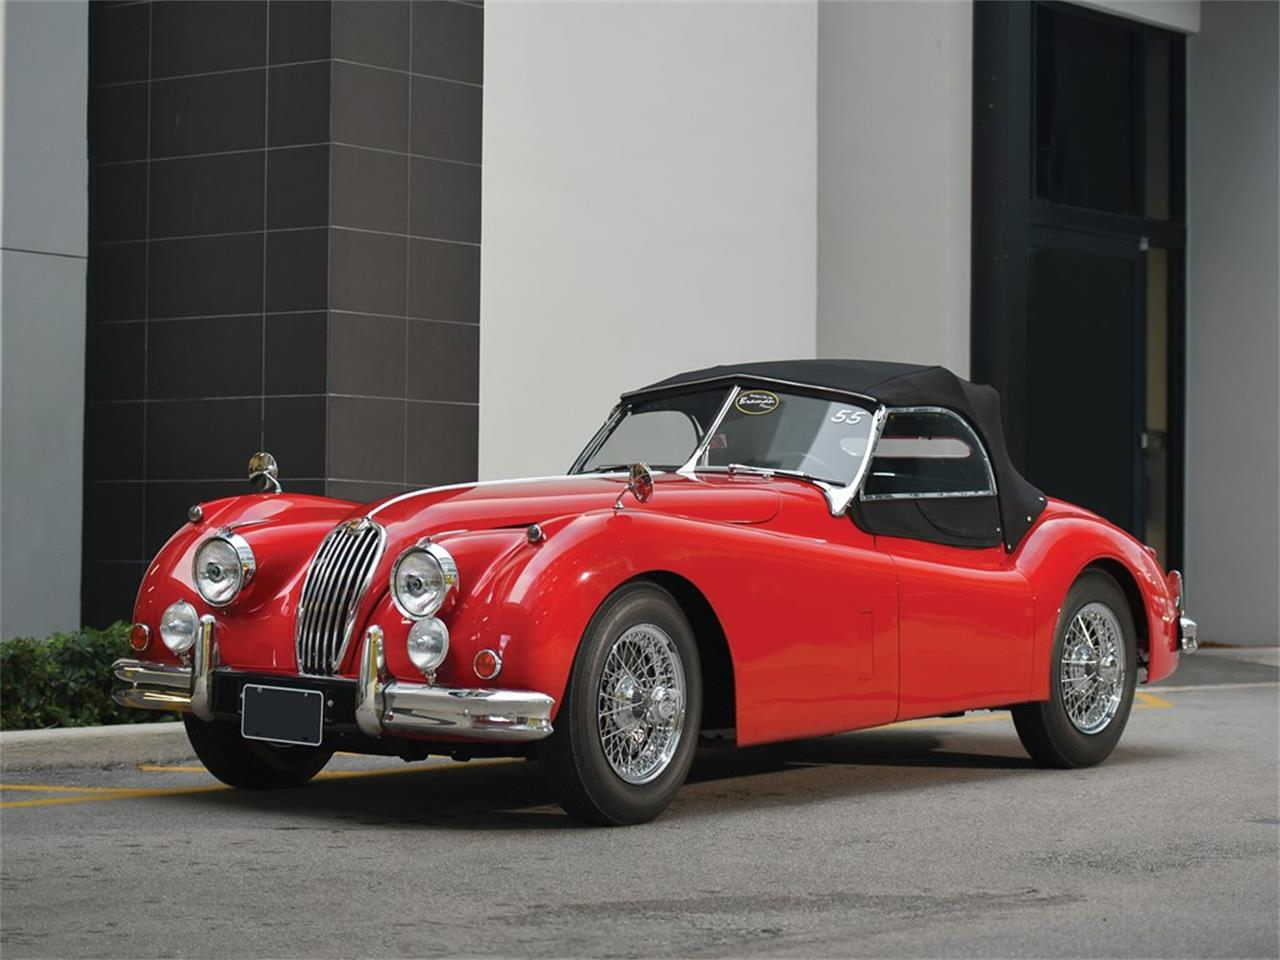 1955 Jaguar Xk 140 Mc Roadster For Sale Classiccars Com Cc 1190941